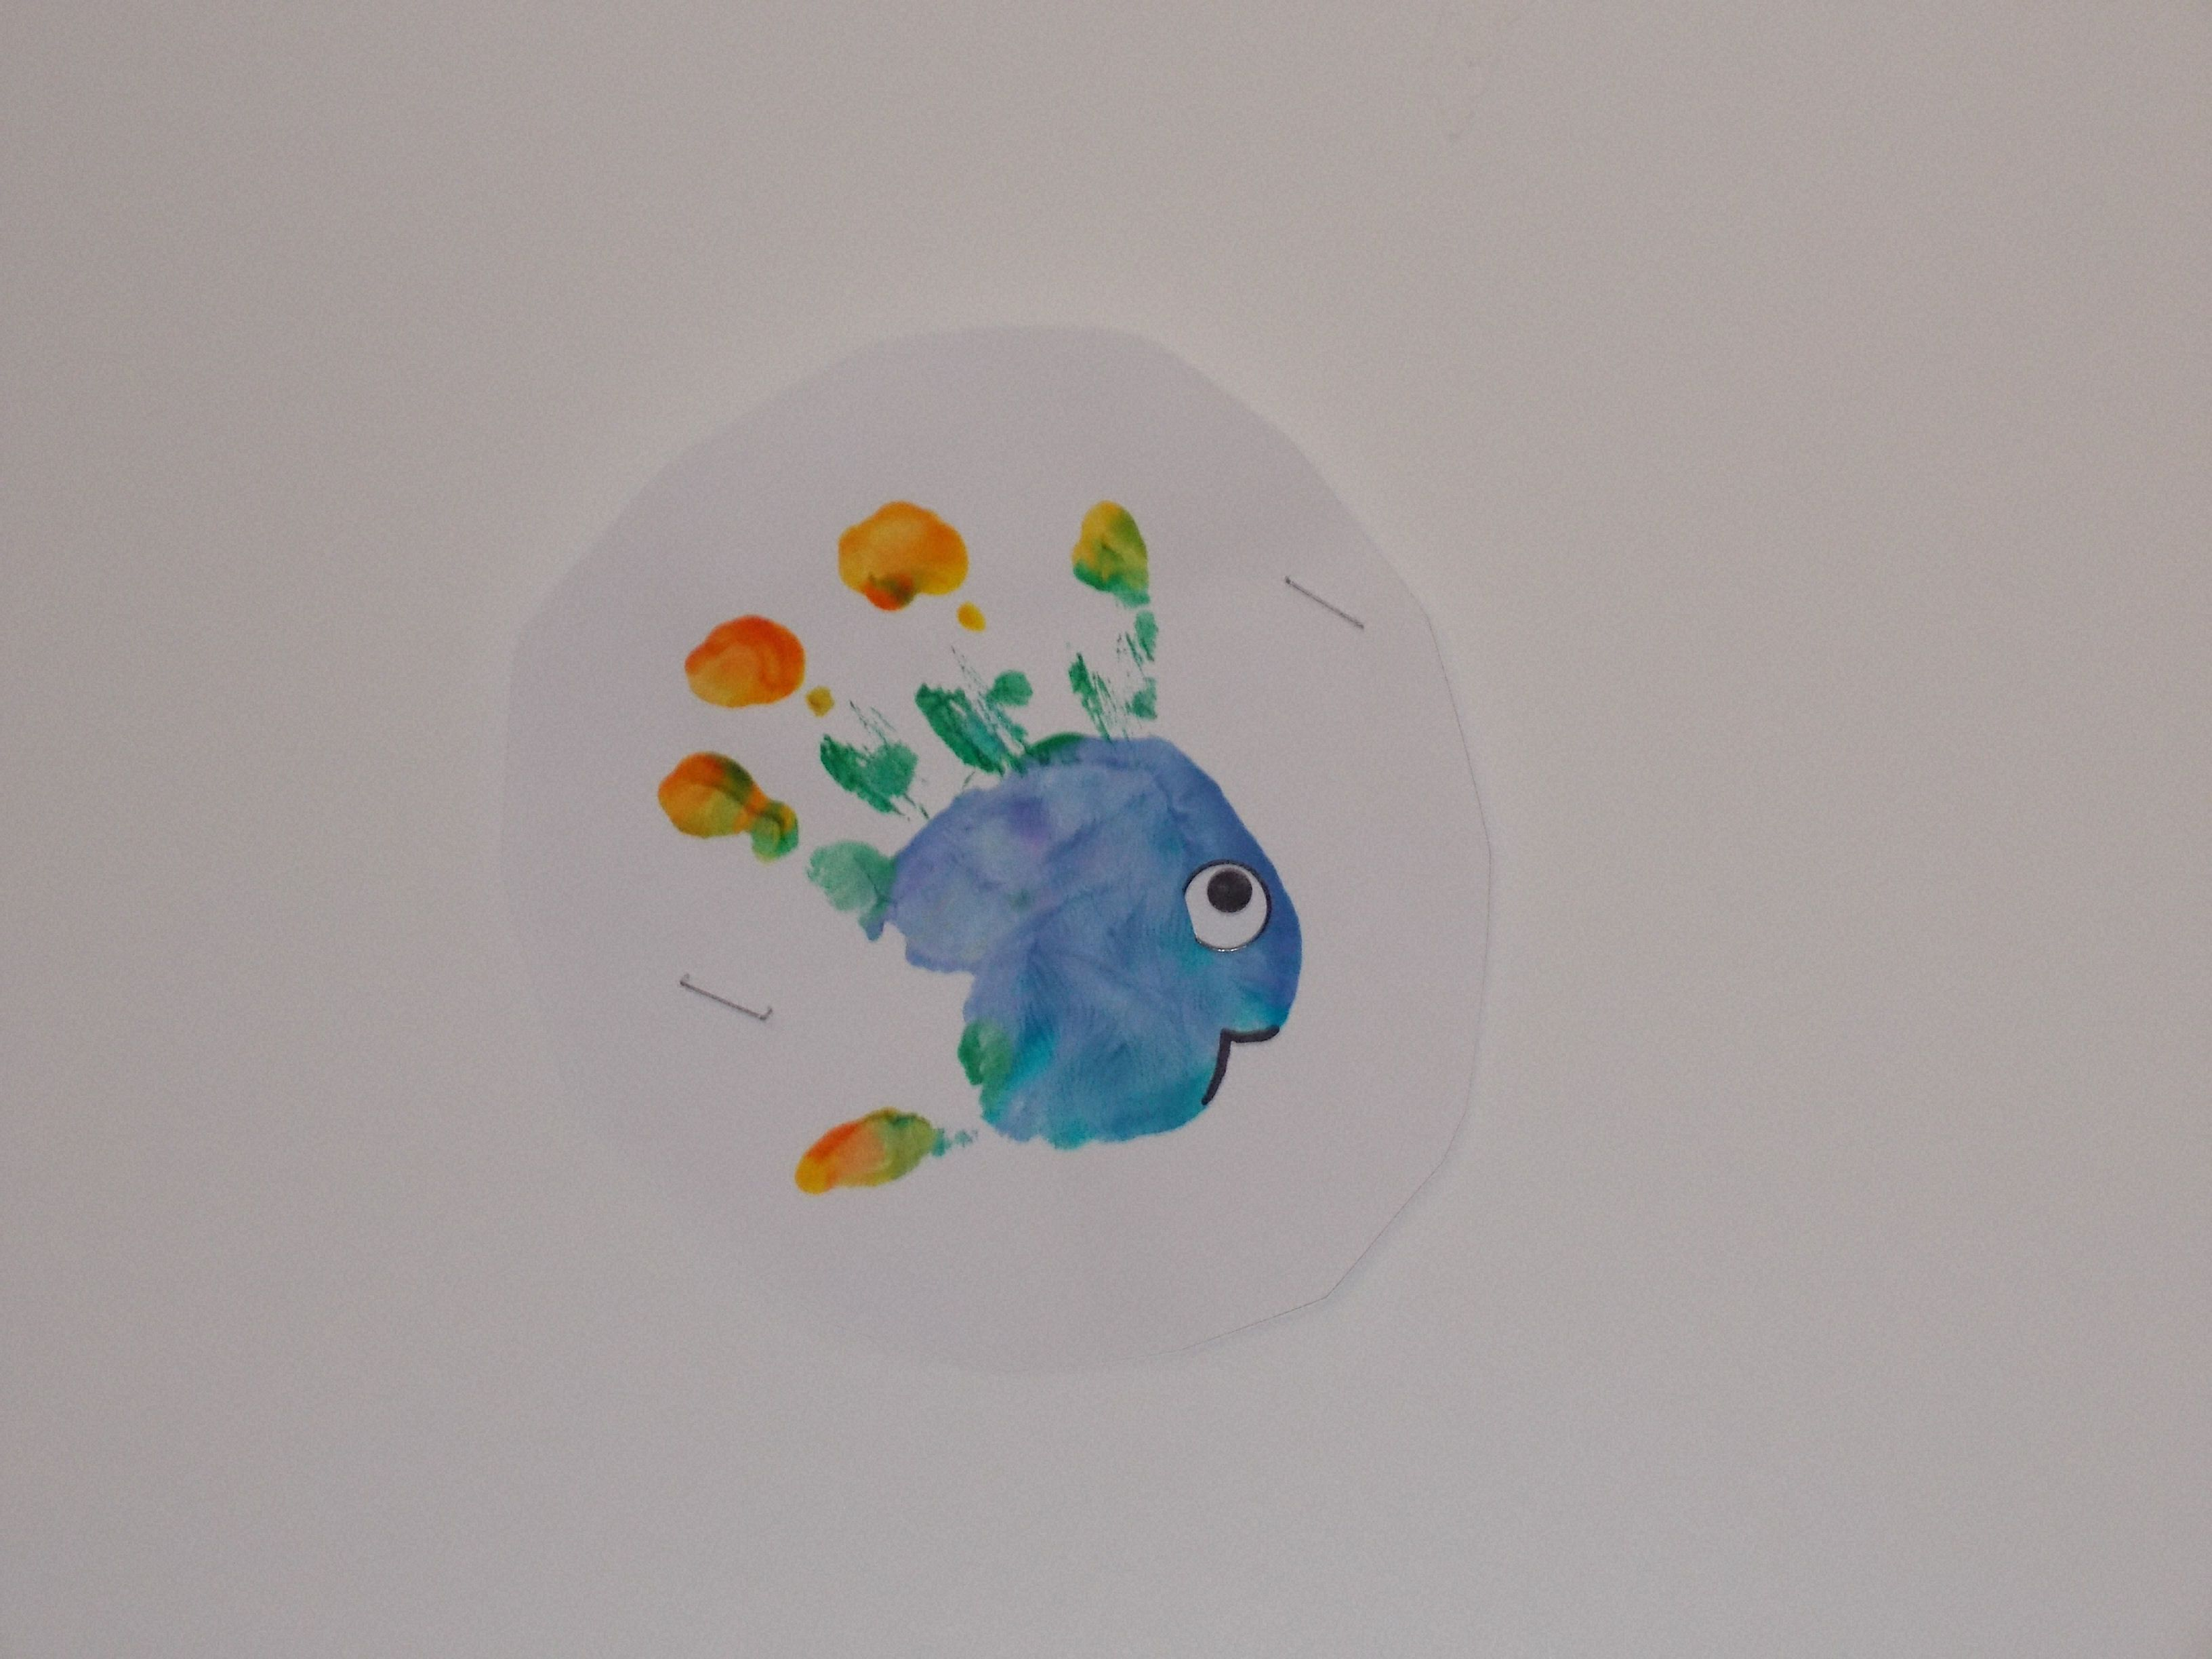 Rainbow Fish Worksheet For Preschool